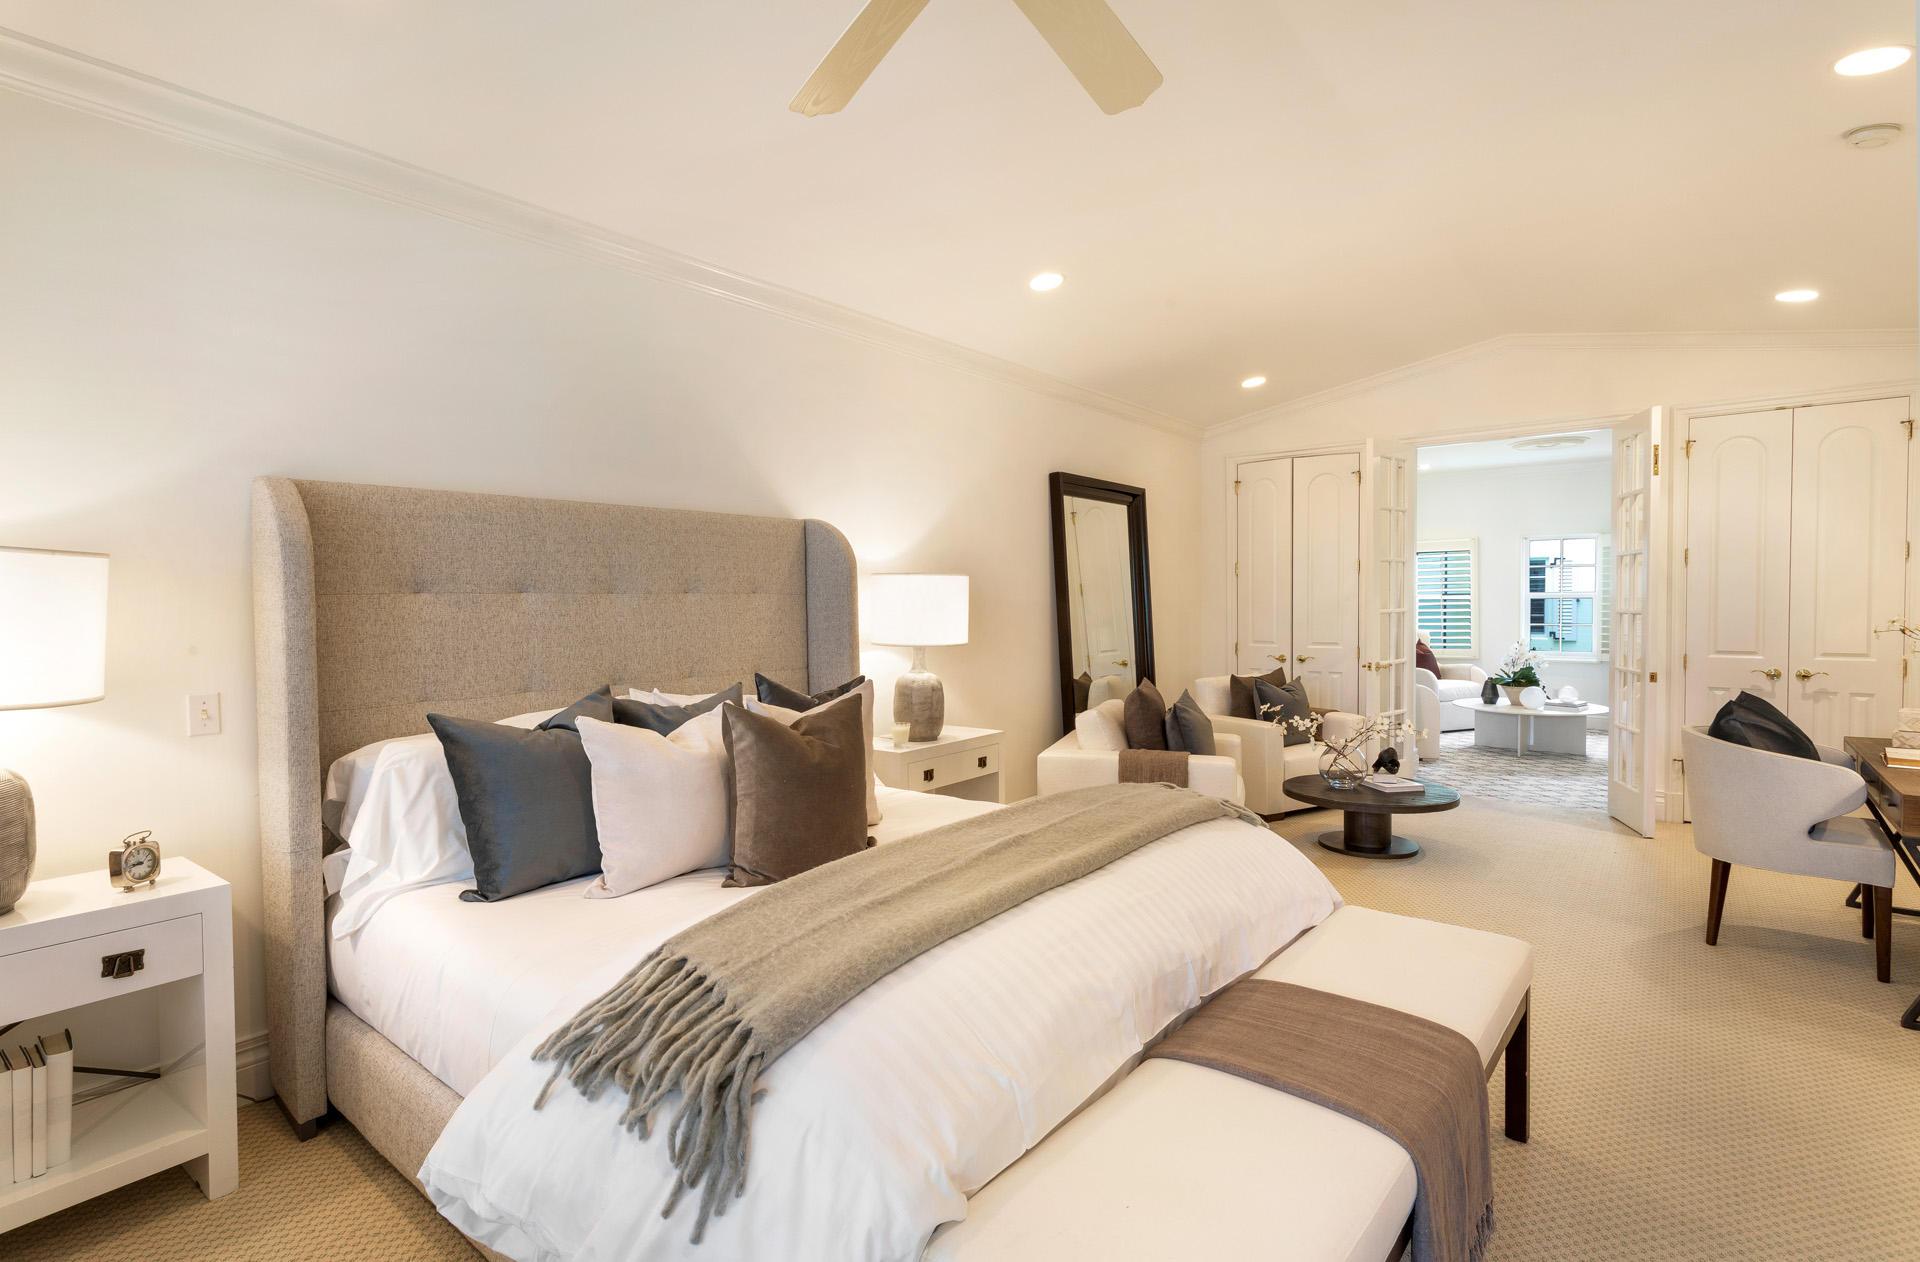 790 Andrews Avenue, Delray Beach, Florida 33483, 3 Bedrooms Bedrooms, ,2.1 BathroomsBathrooms,Townhouse,For Sale,Andrews,RX-10591892